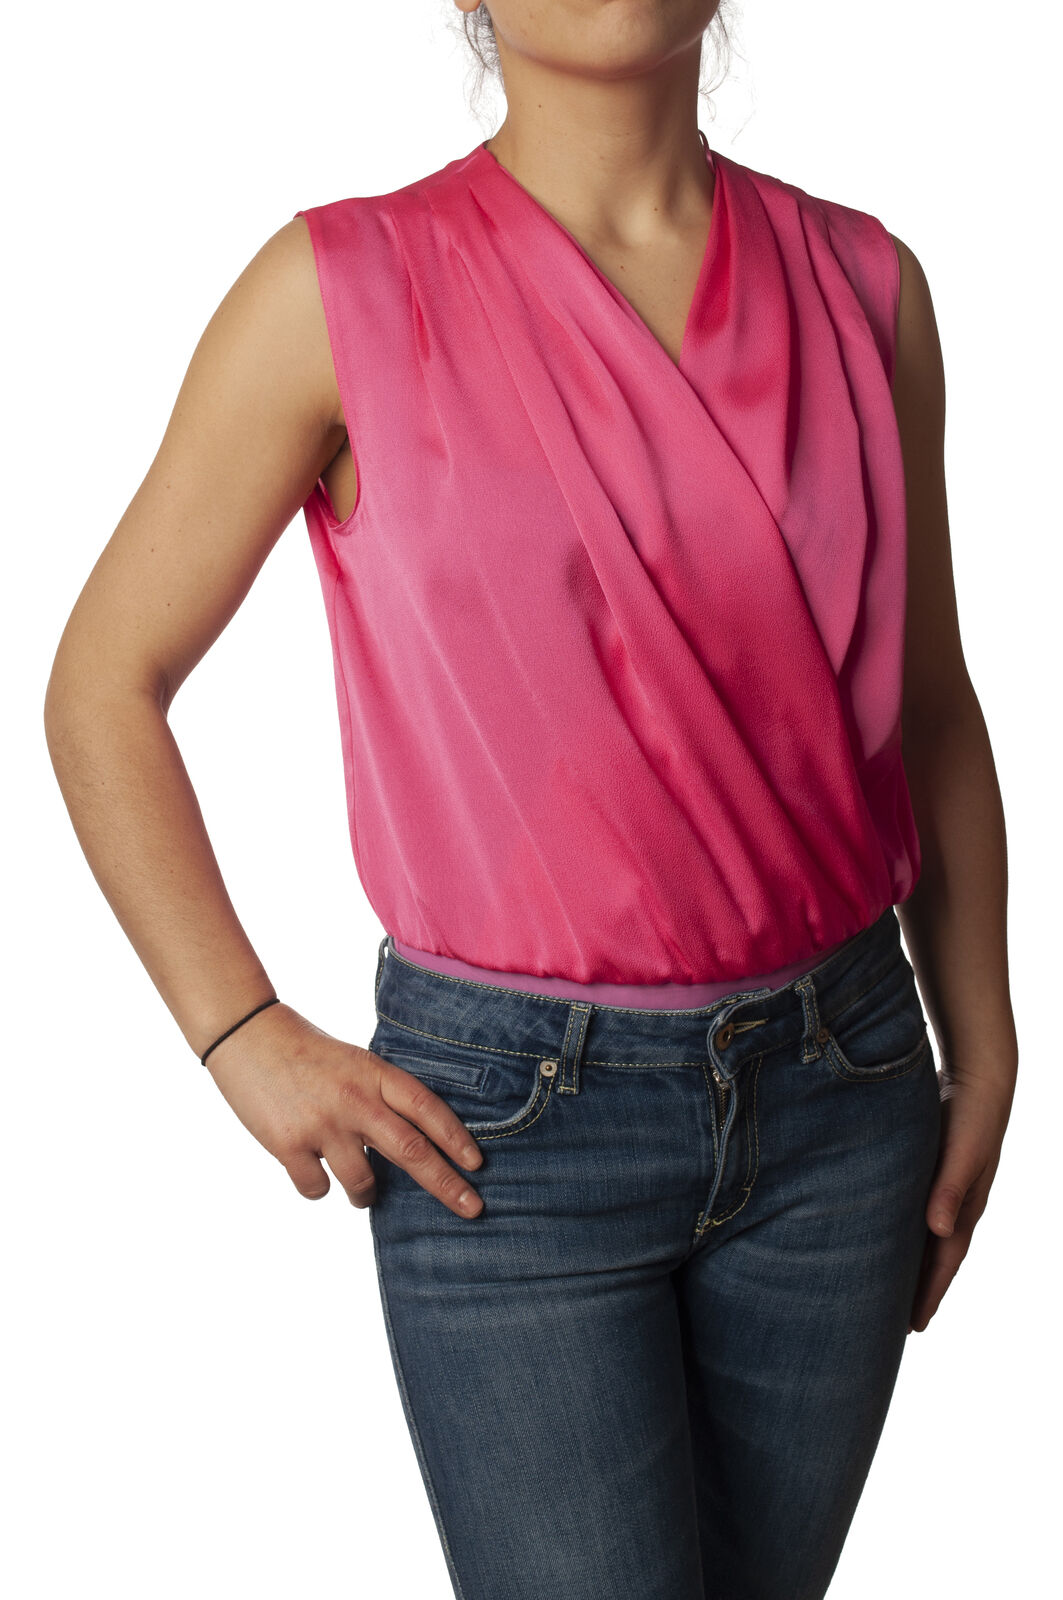 Rosao - Shirts-Blouses - Woman - Rosa - 5879713D191225